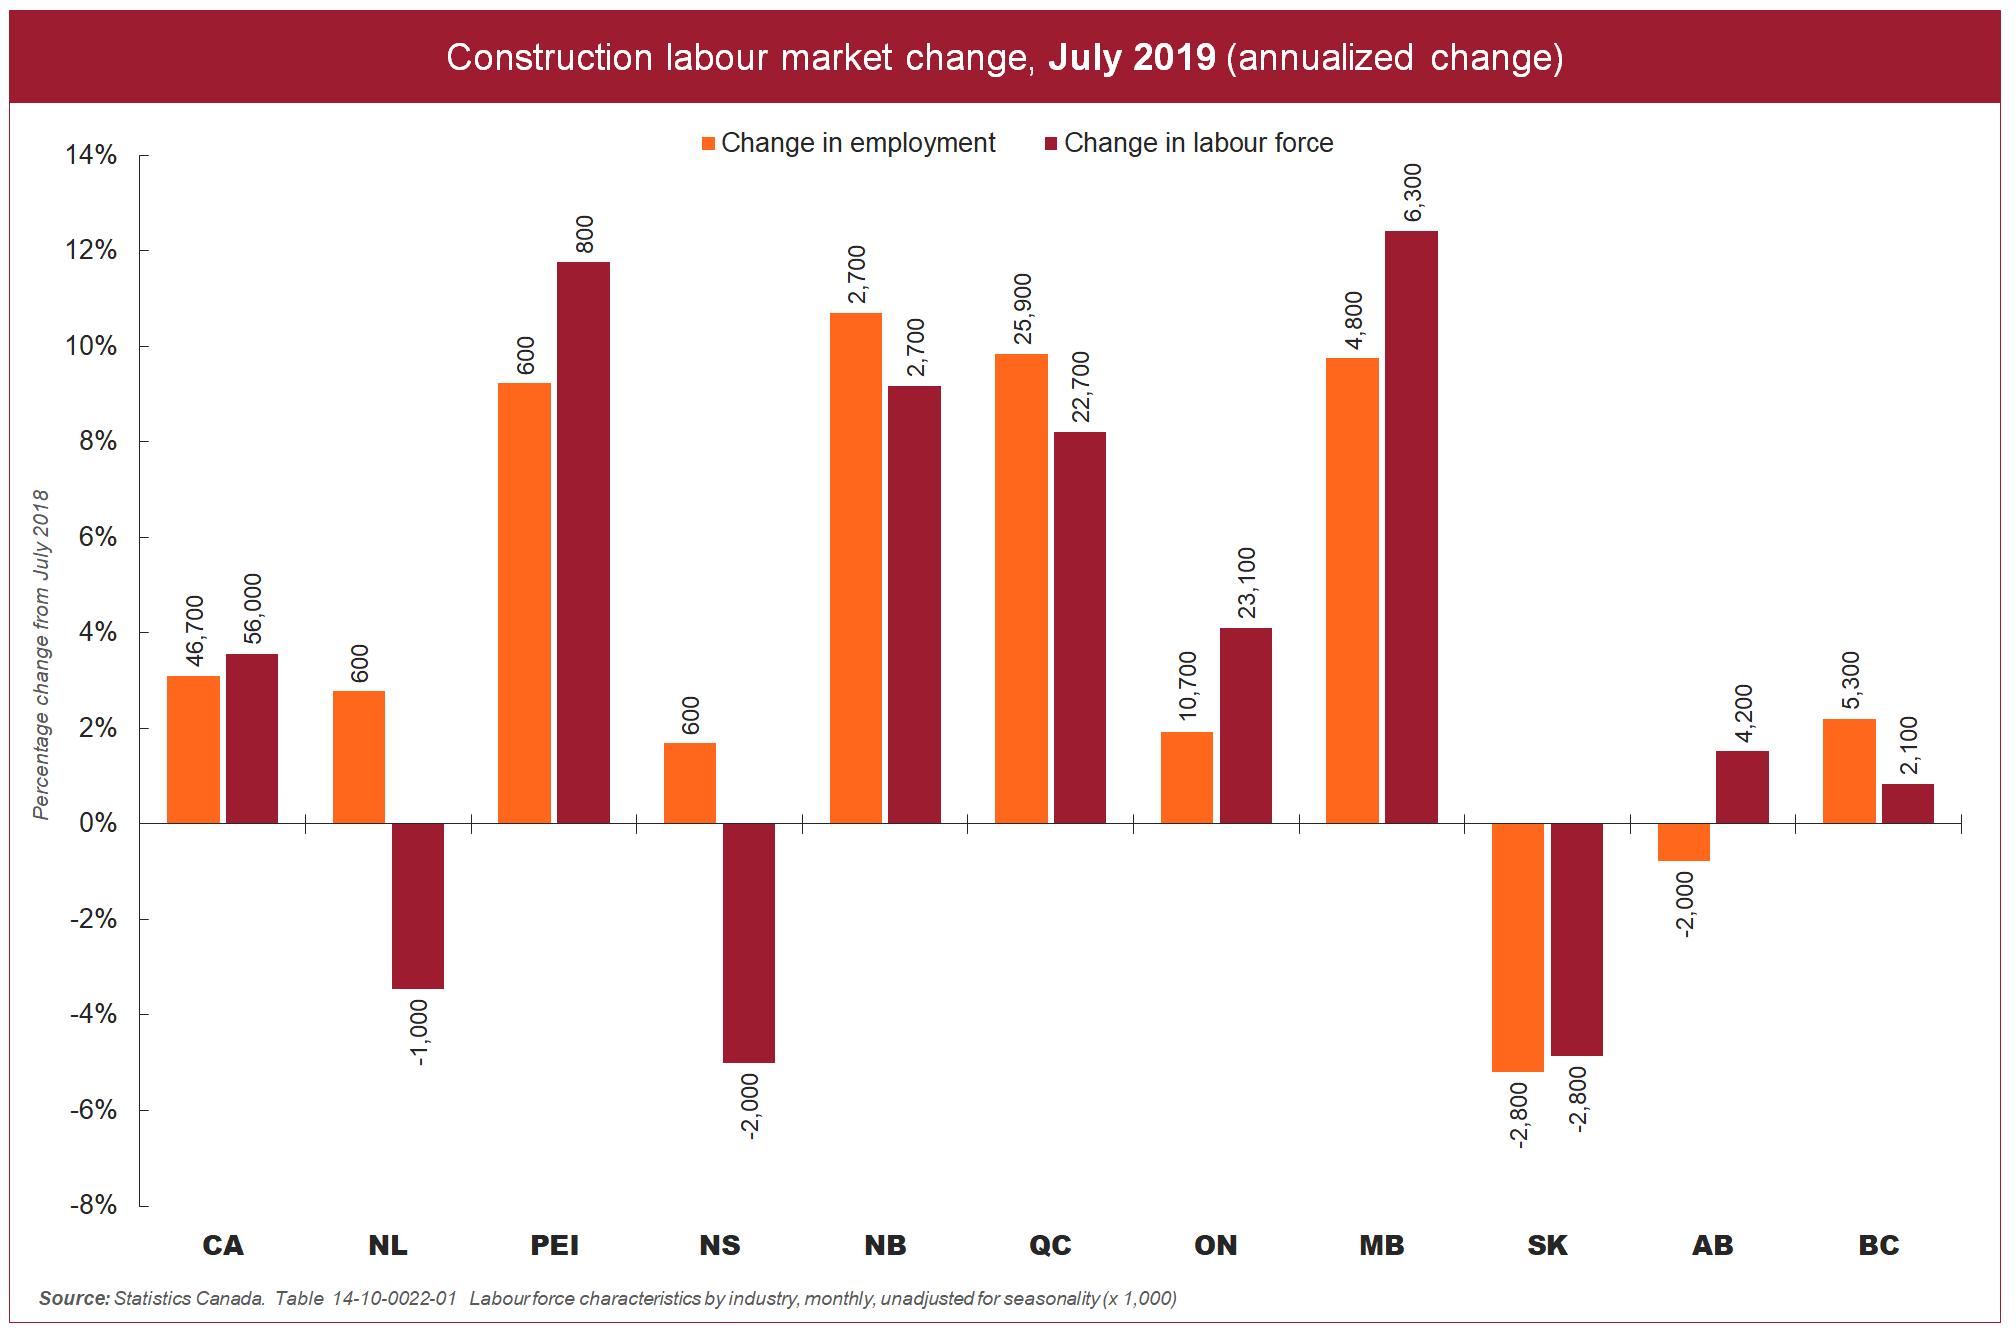 [graph] Construction labour market change, July 2019 (annualized change)